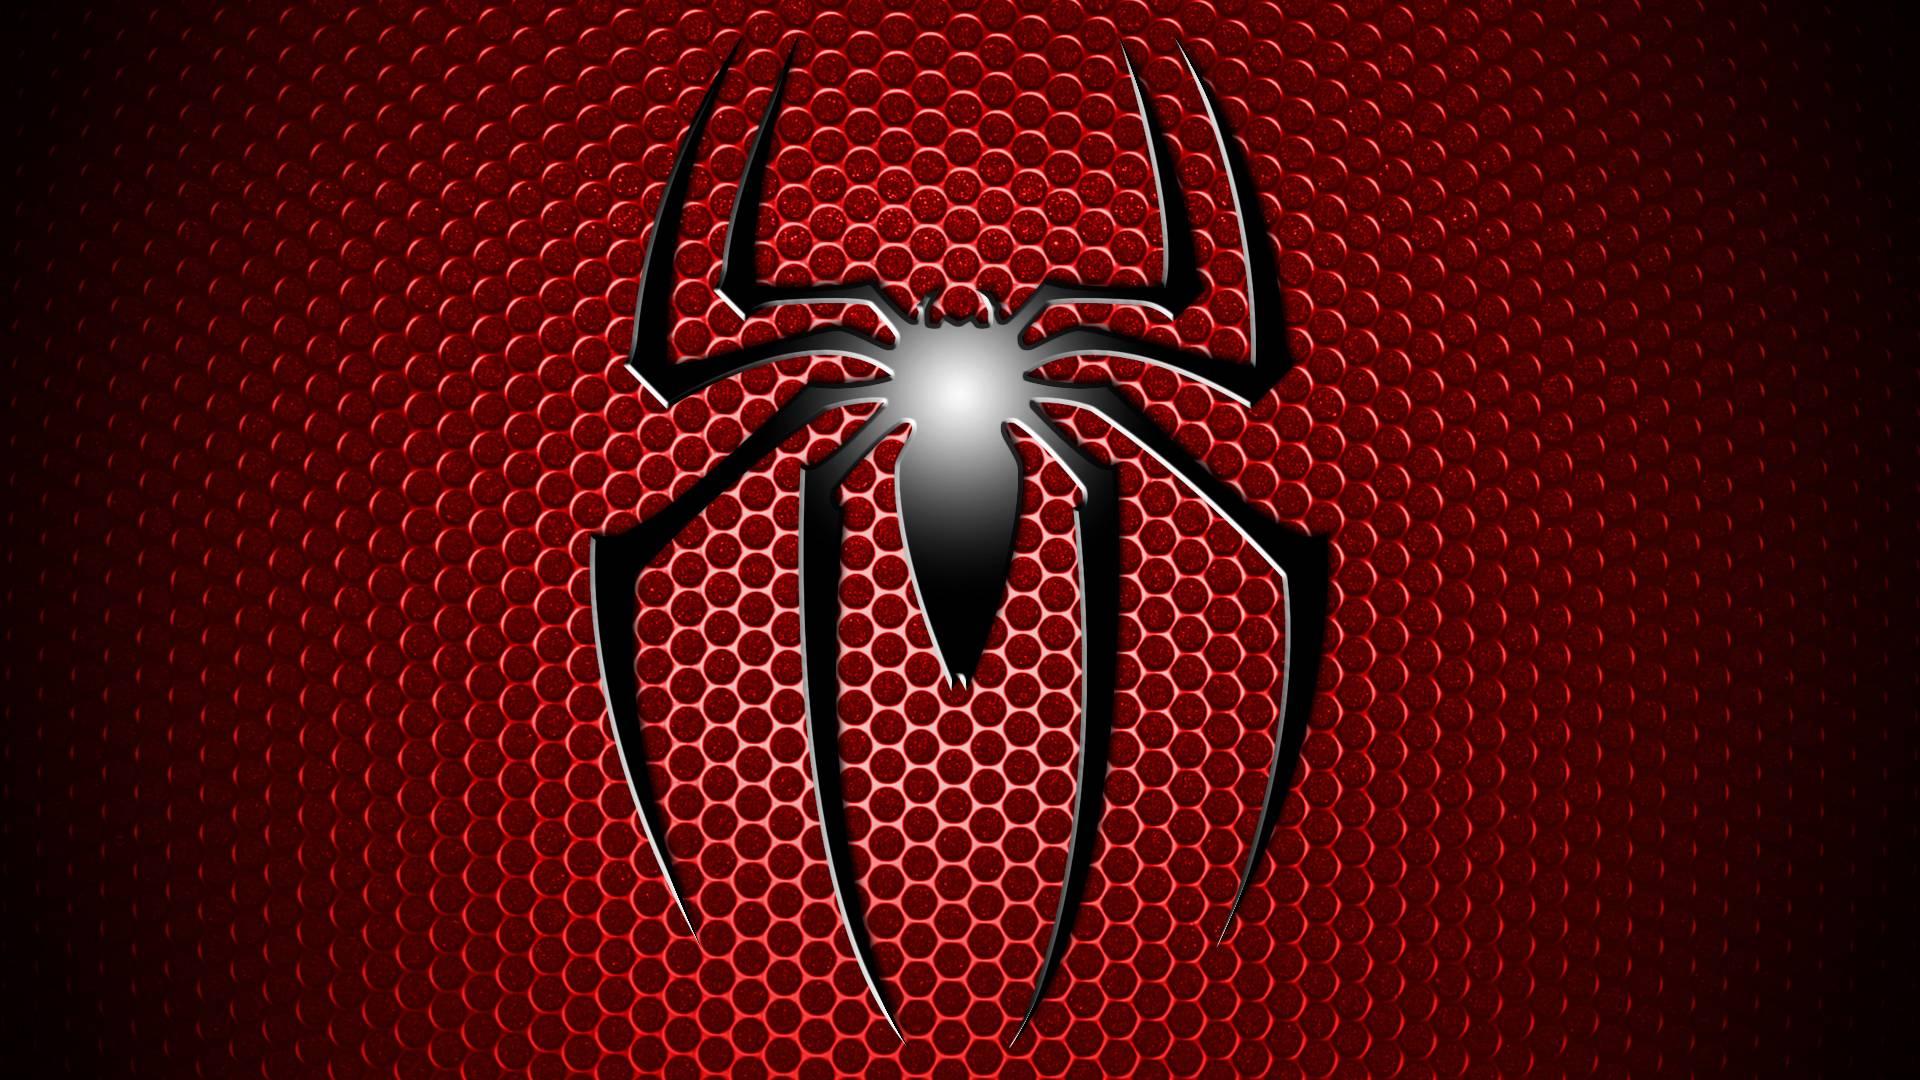 Theoretical Thursday Spiderman Christa Yelich Koth